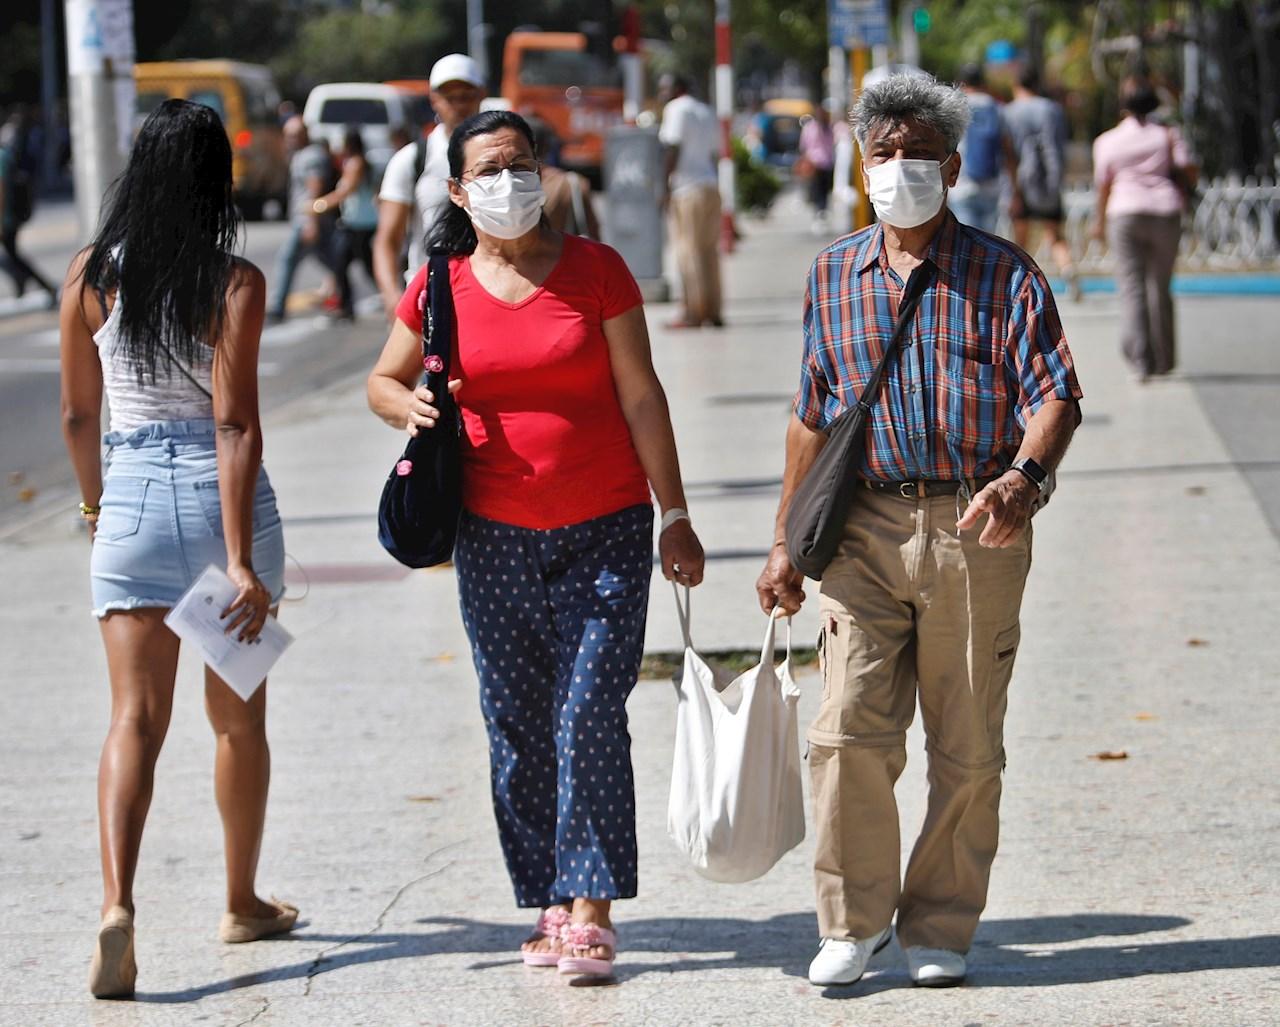 Coronavirus avanza en Centroamérica: Panamá reporta 2 muertos